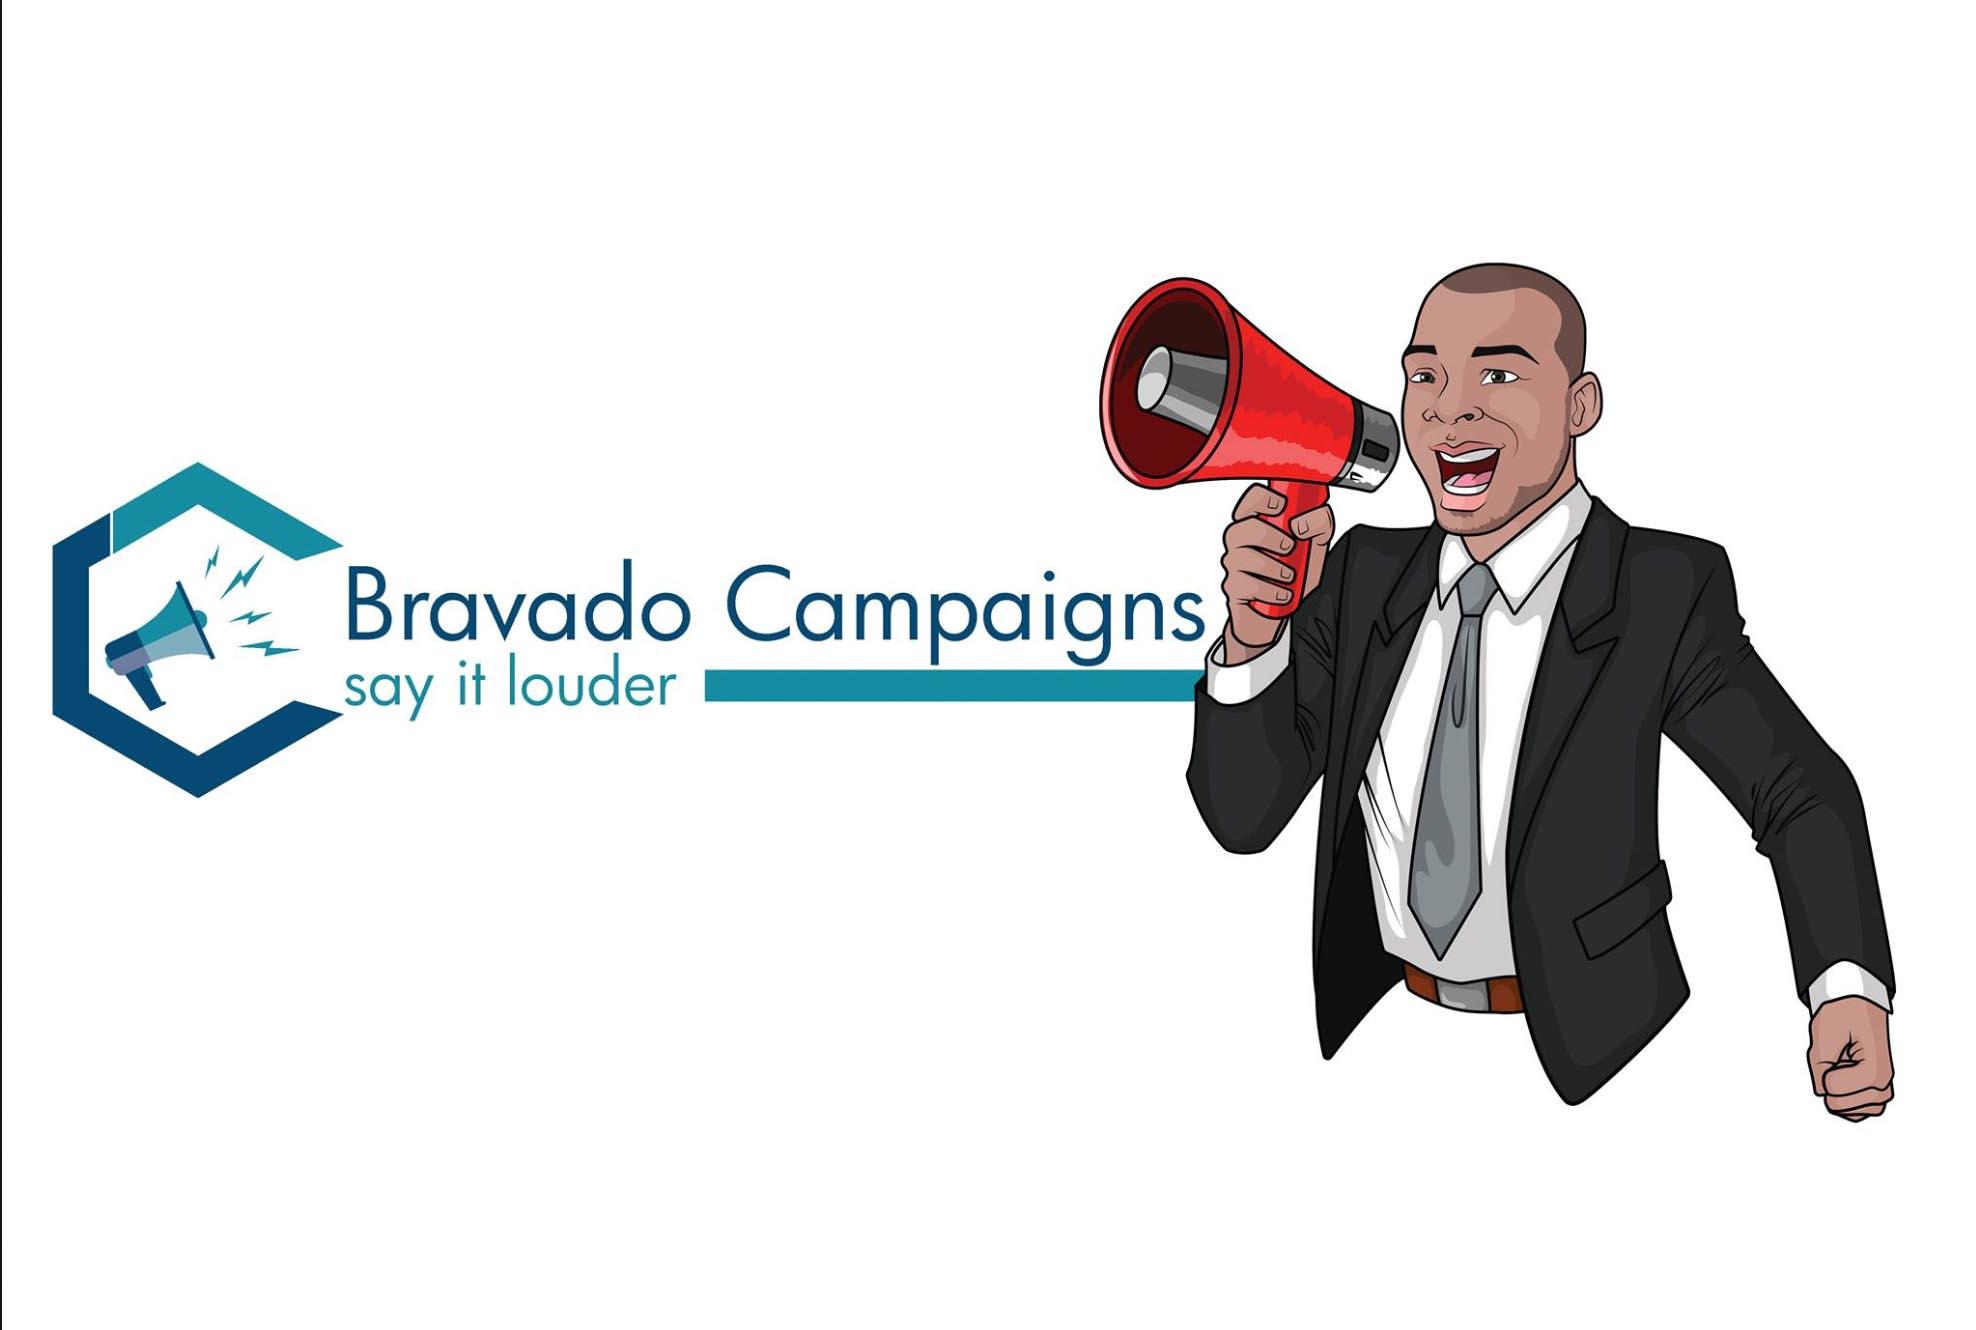 Bravado Campaigns, a chatbot developer